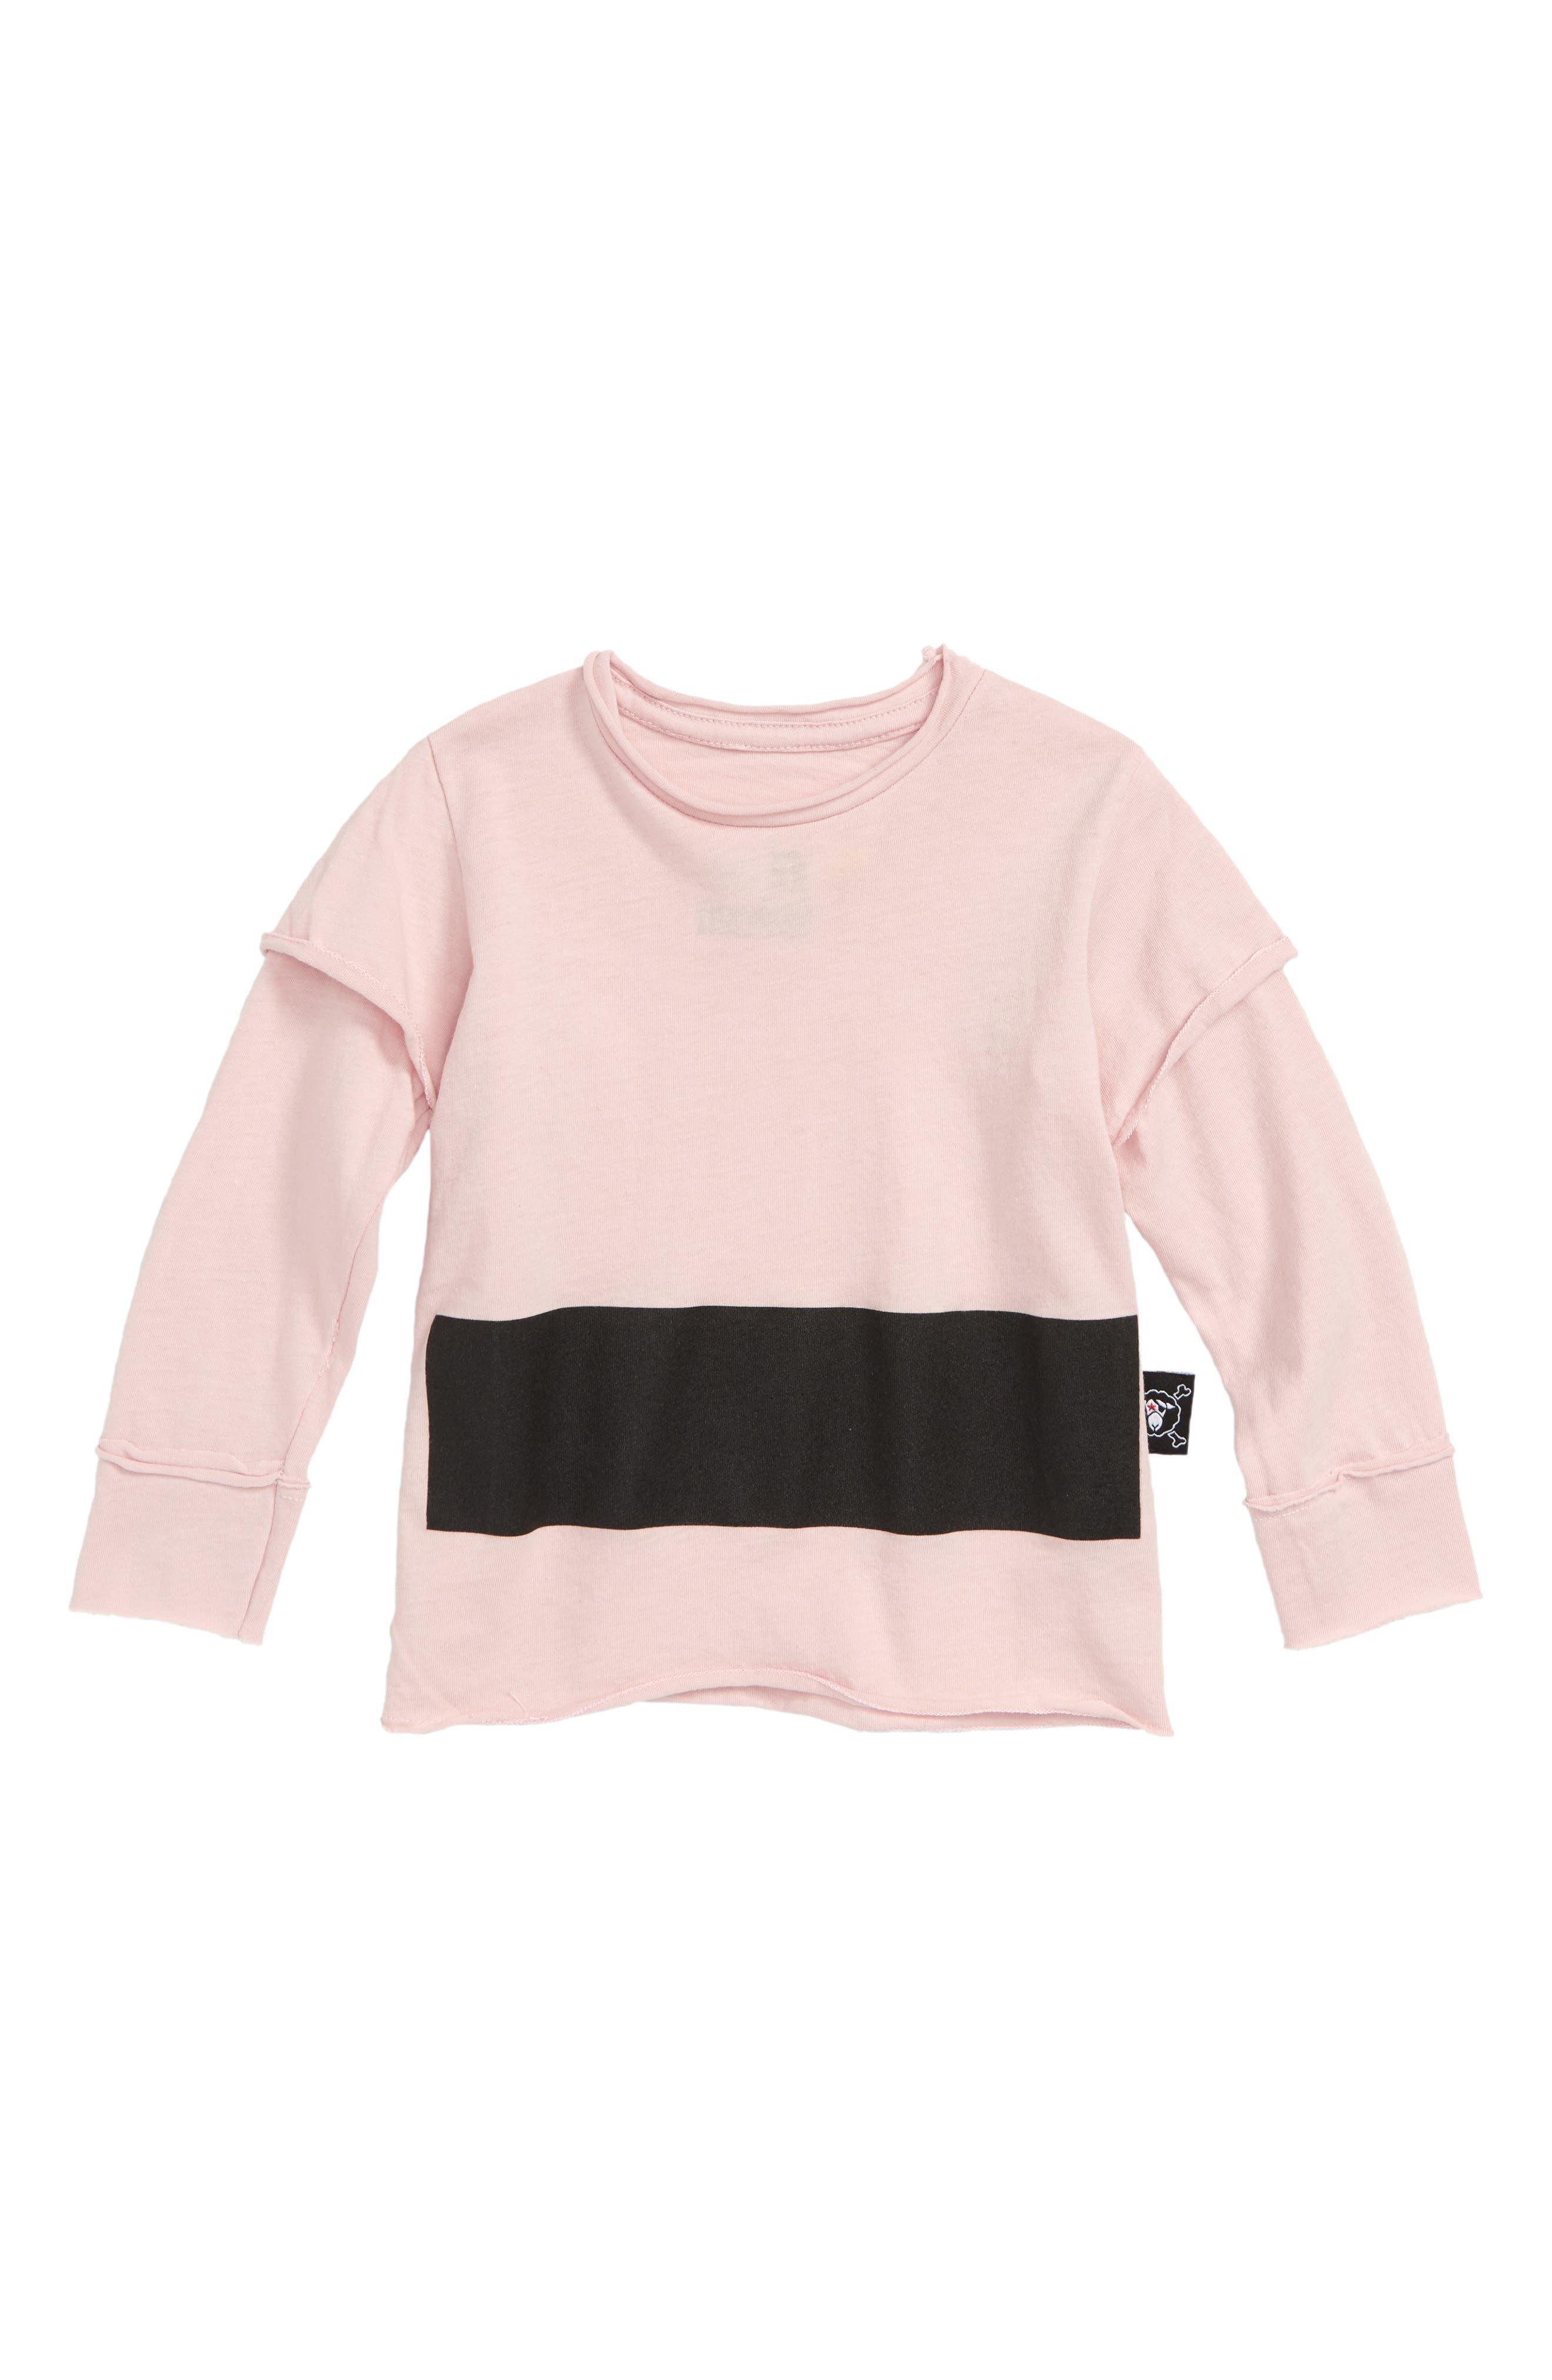 Stripe Tee,                             Main thumbnail 1, color,                             Powder Pink